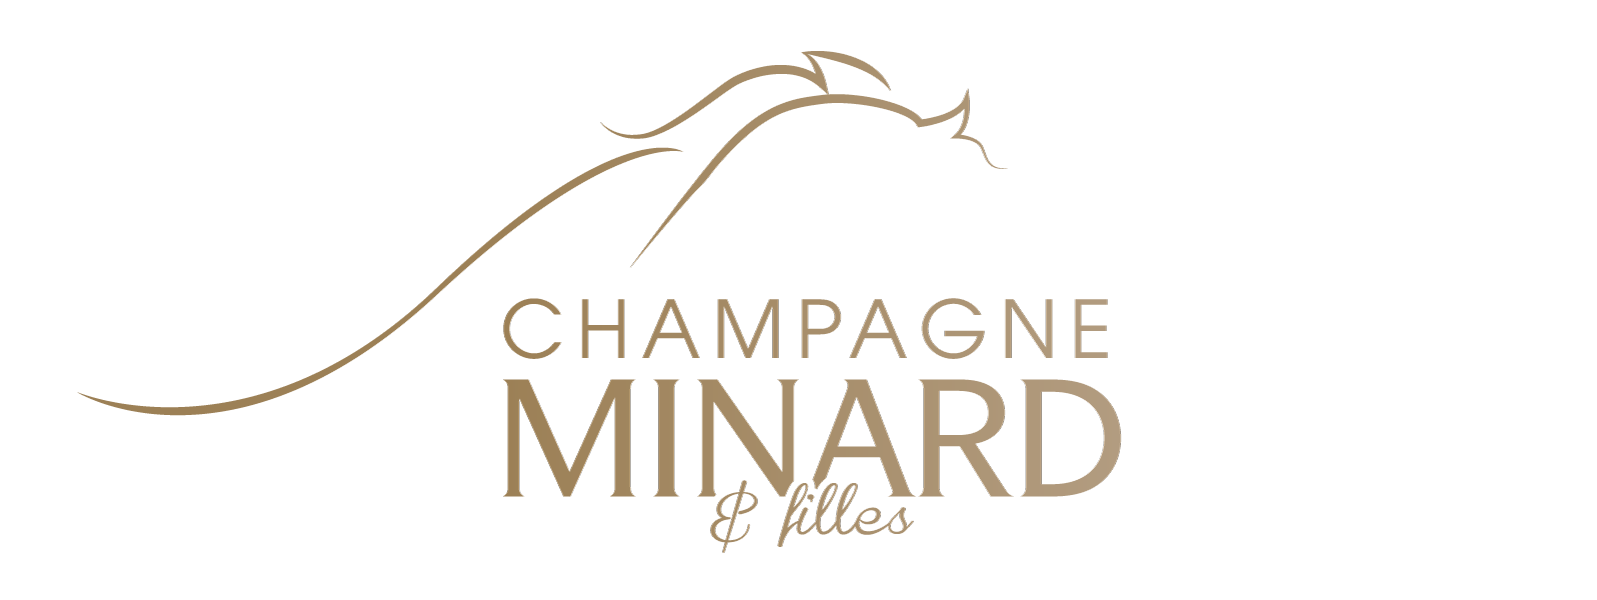 Champagne Minard & filles à Courmas